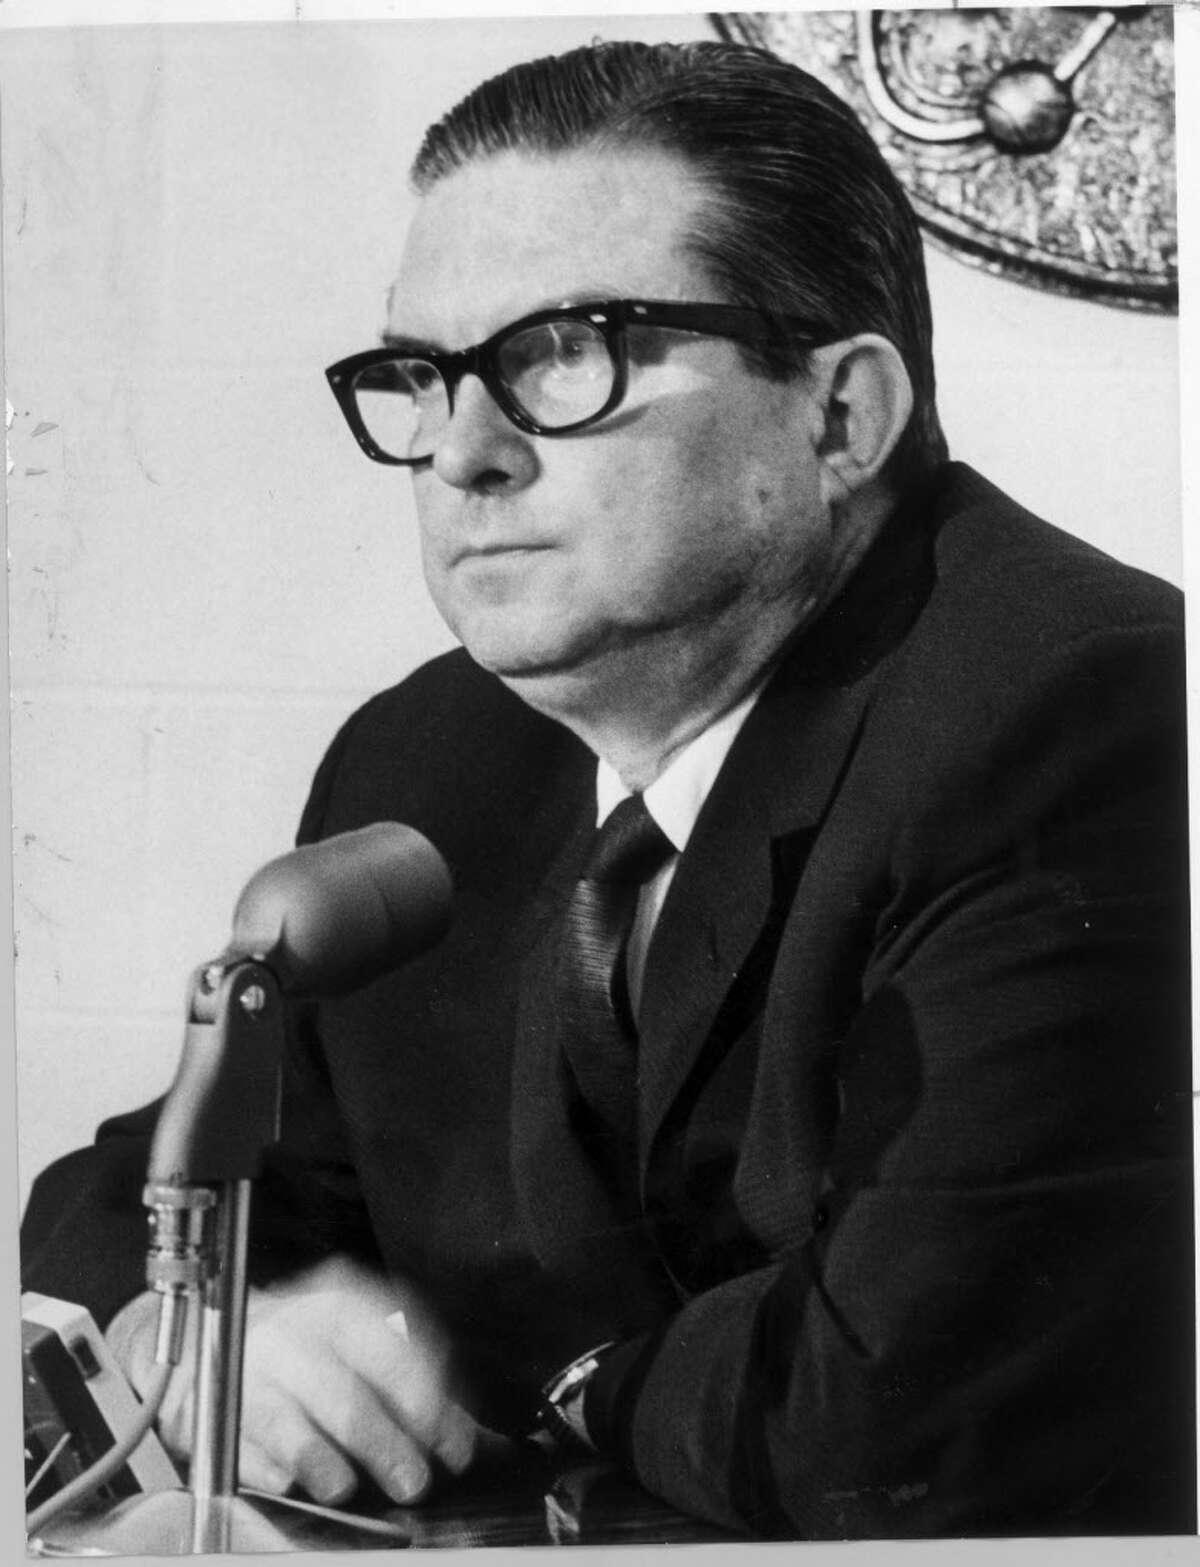 Roy Hofheinz, Houston Sports Association, July 7, 1965. Photo by Larry Evans / Houston Chronicle